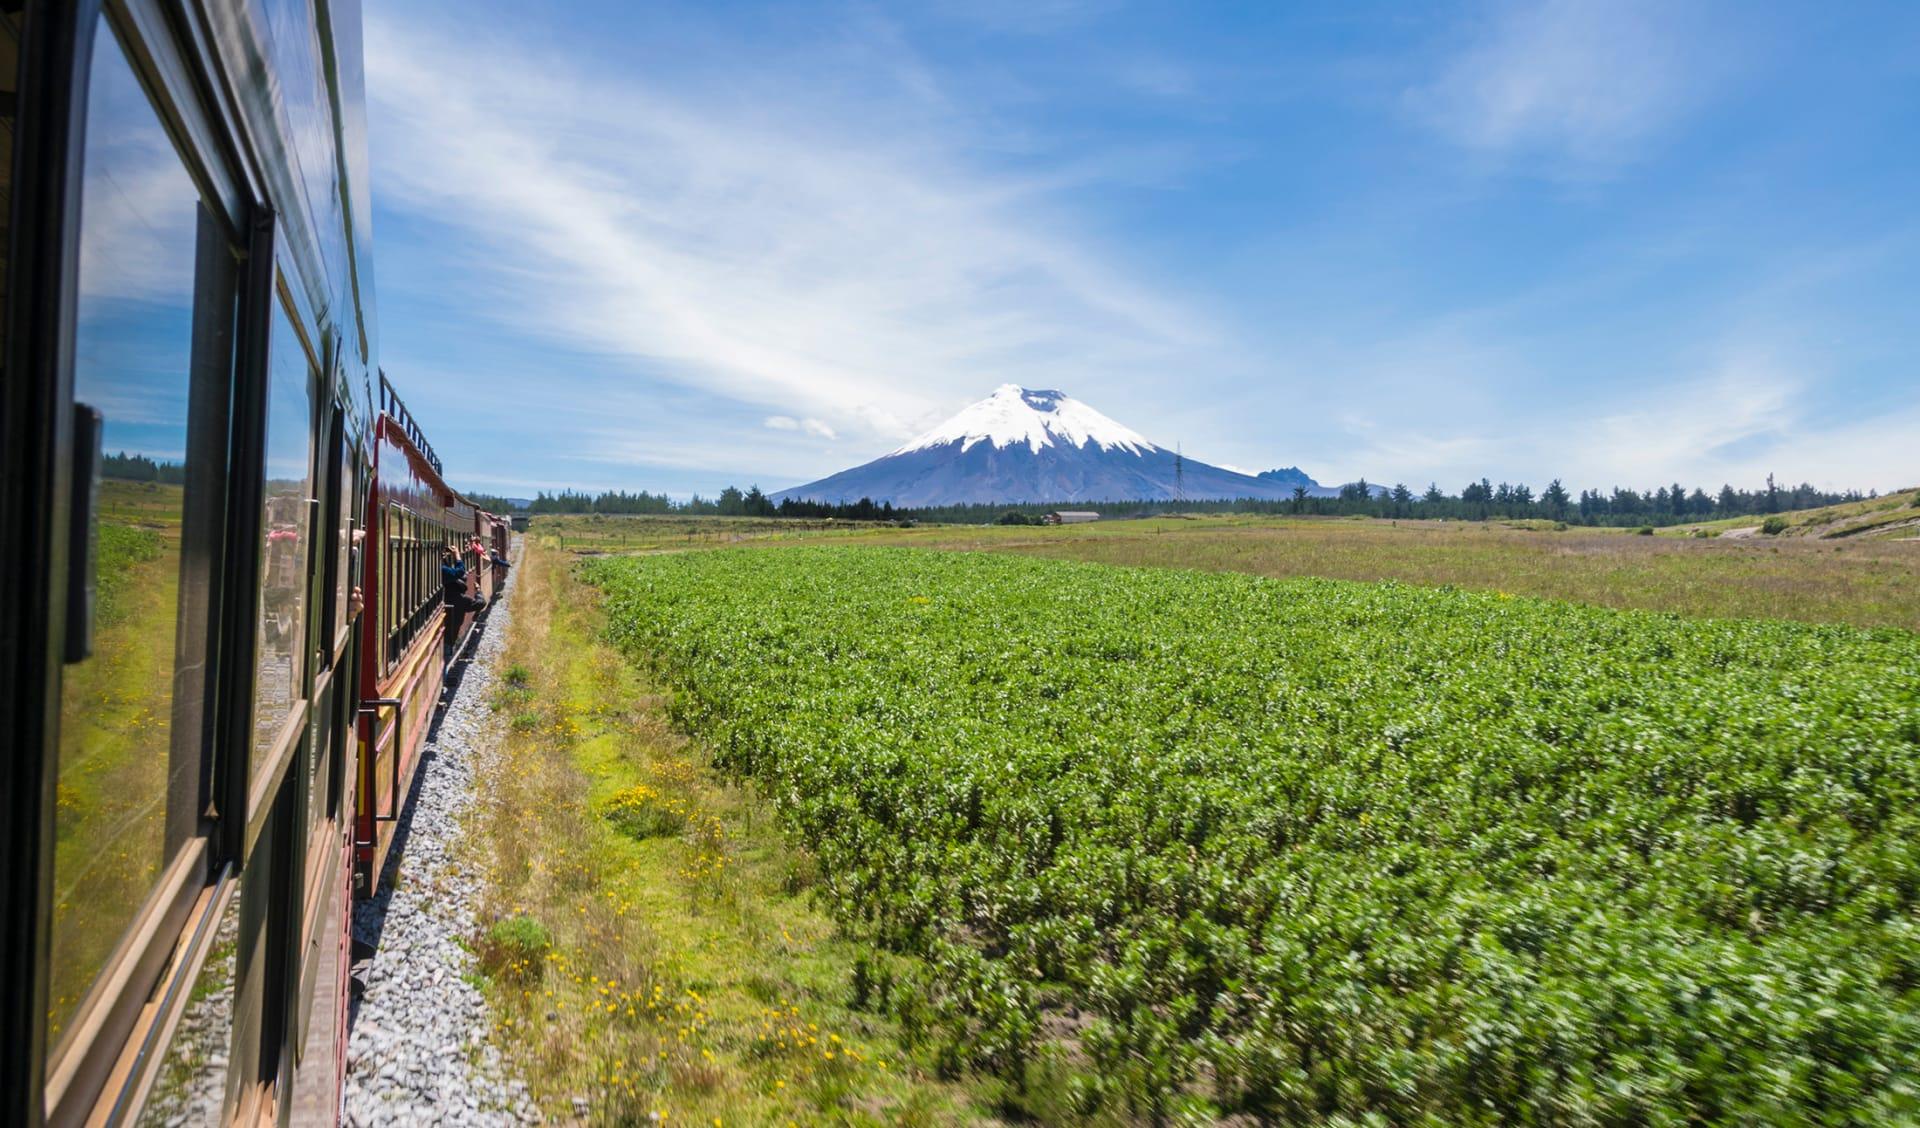 Train of the Volcanoes, Ecuador